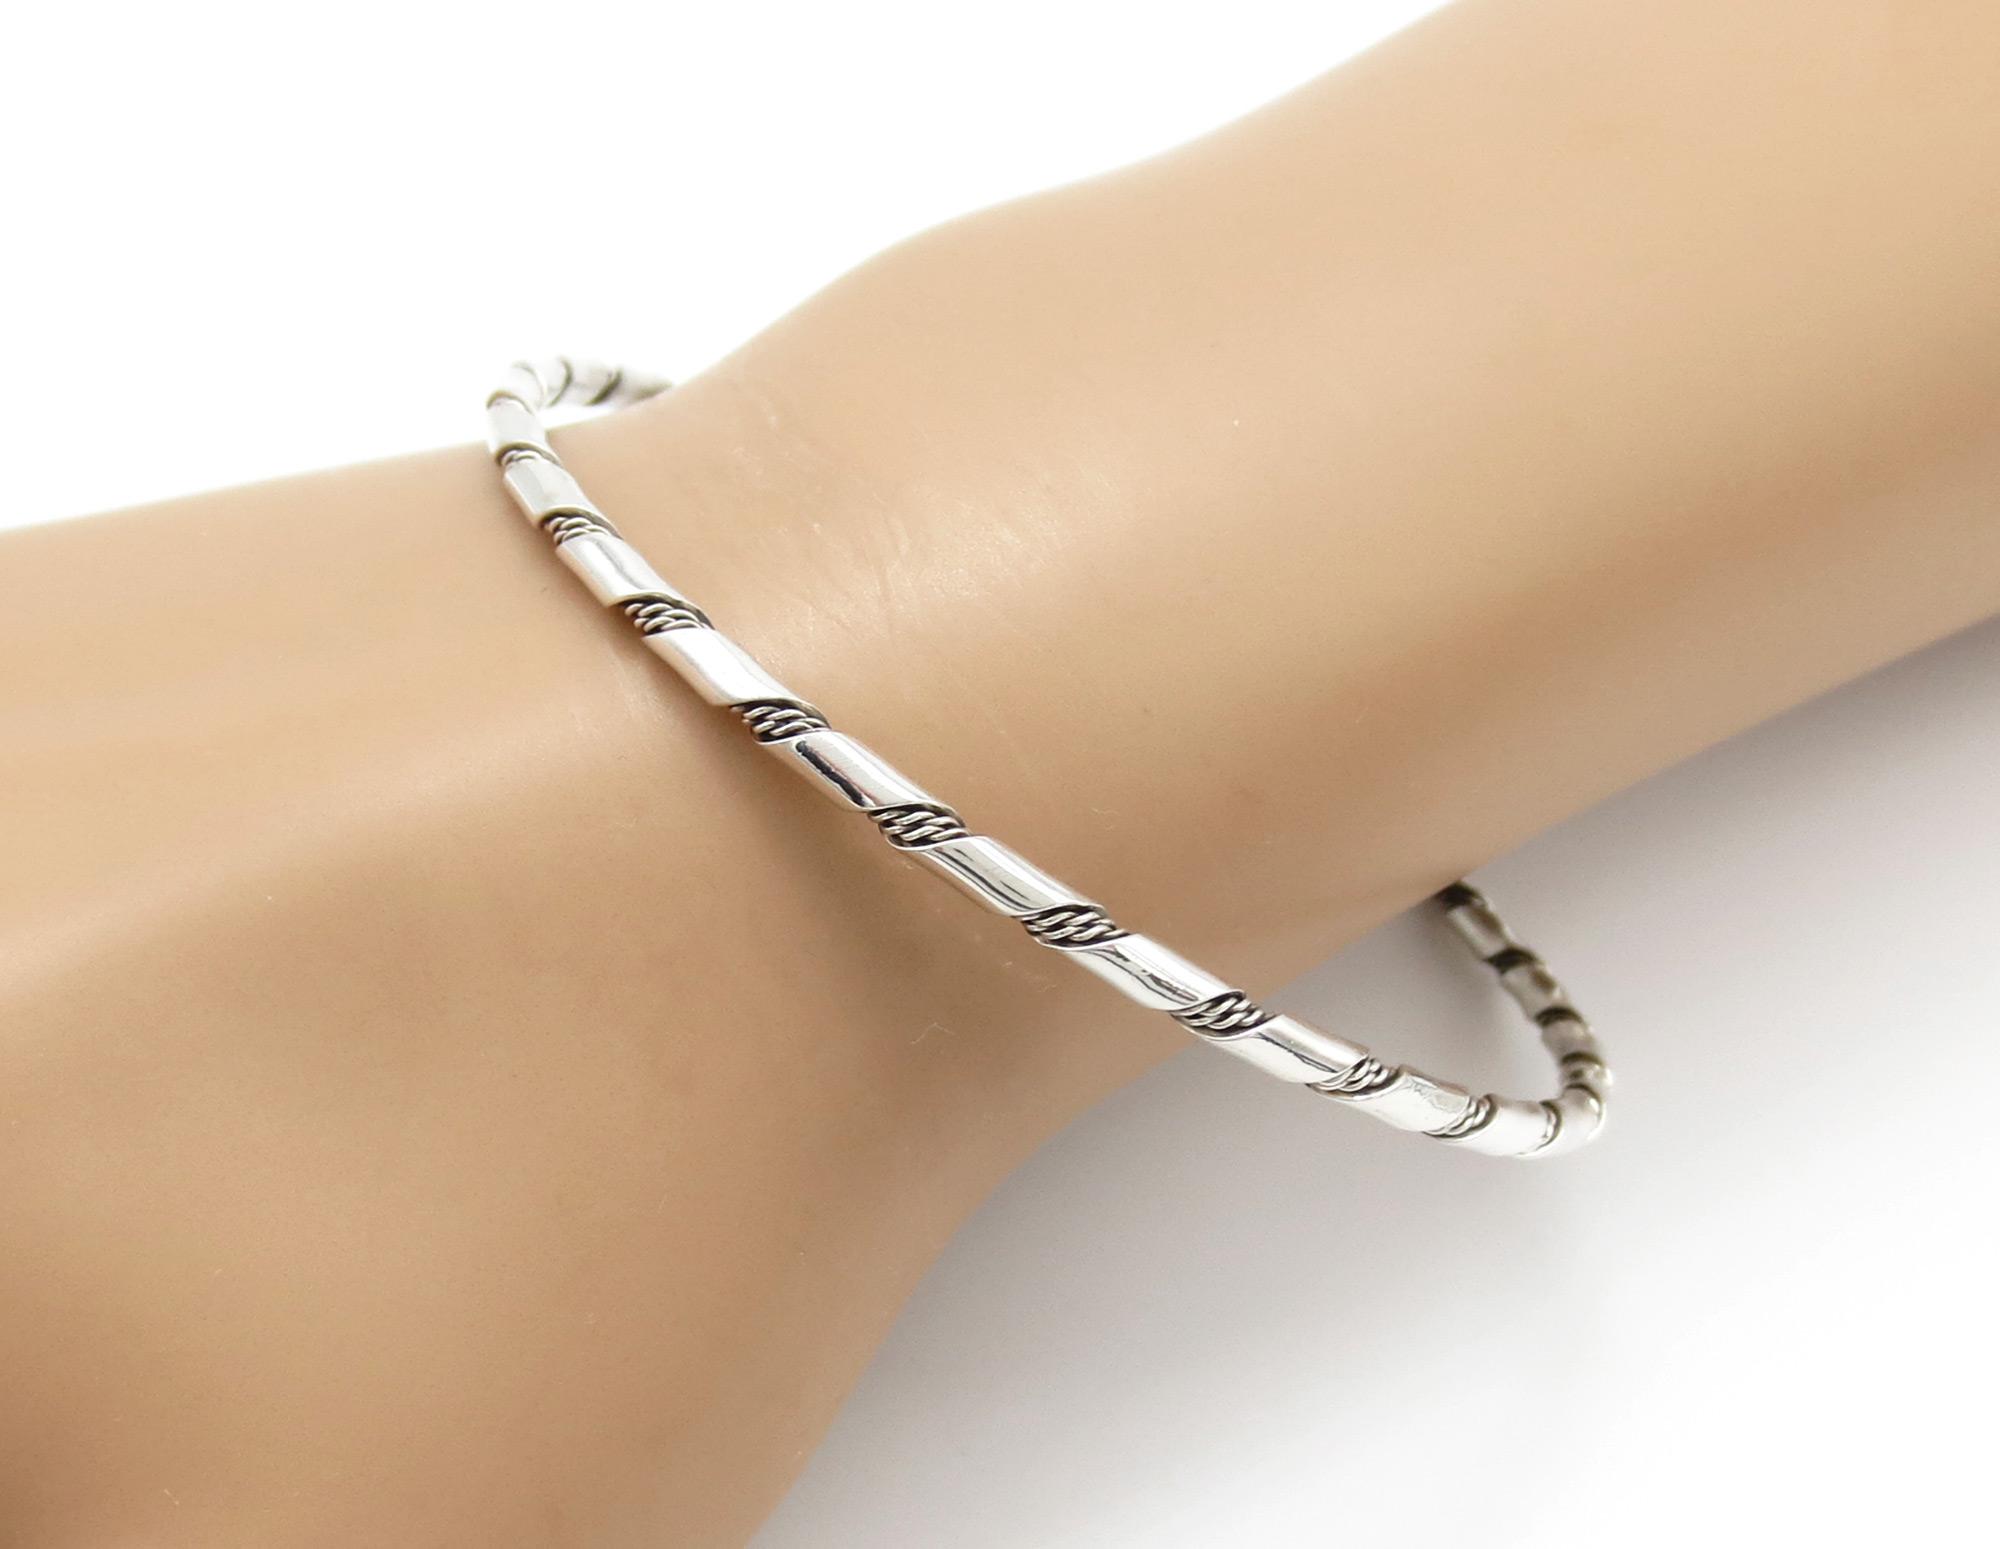 Sterling Silver Bangle Bracelet Native American Jewelry - 3945rb